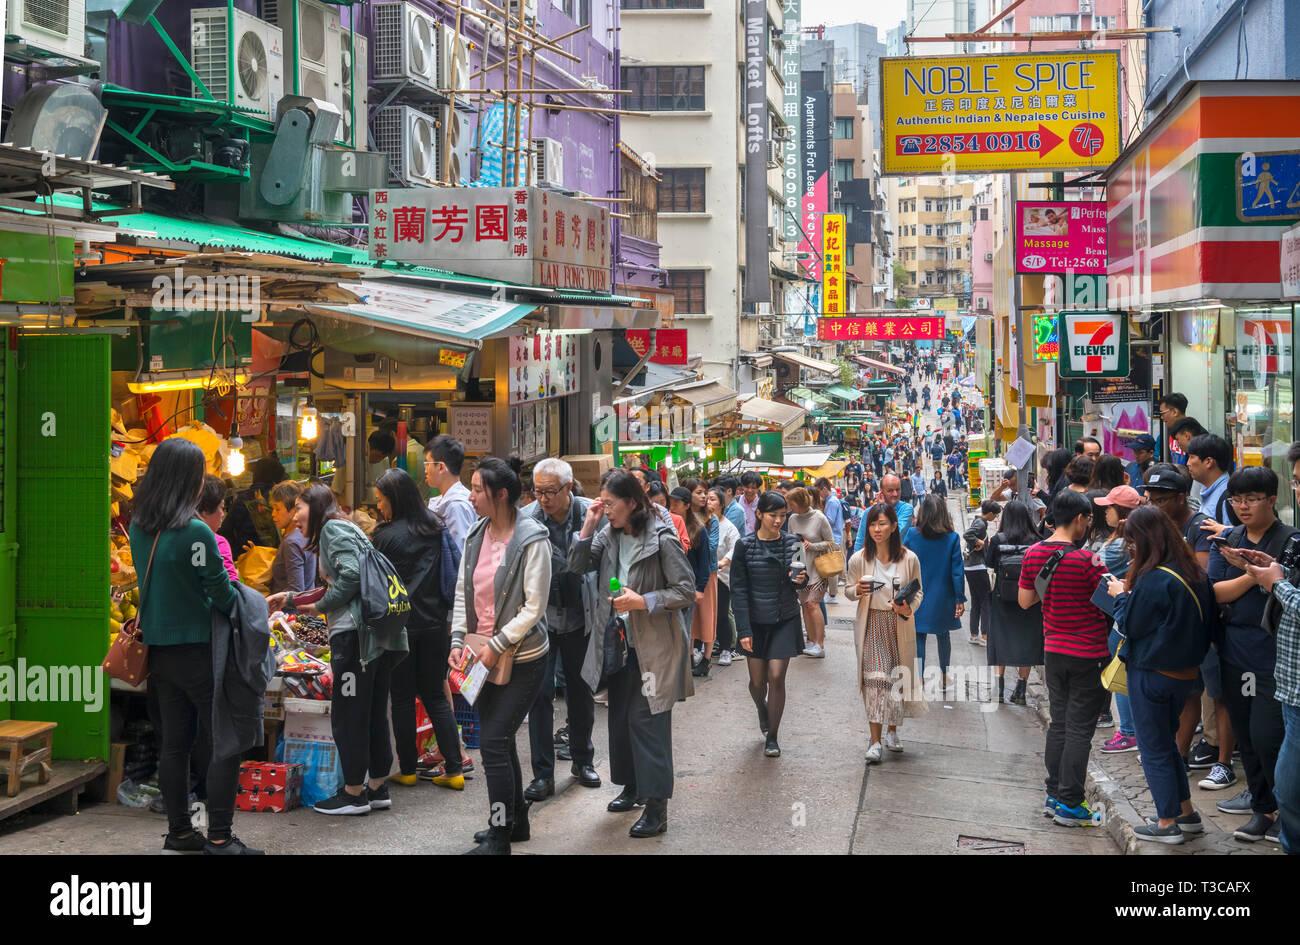 Sul mercato Gage Street nel quartiere centrale, Isola di Hong Kong, Hong Kong, Cina Immagini Stock